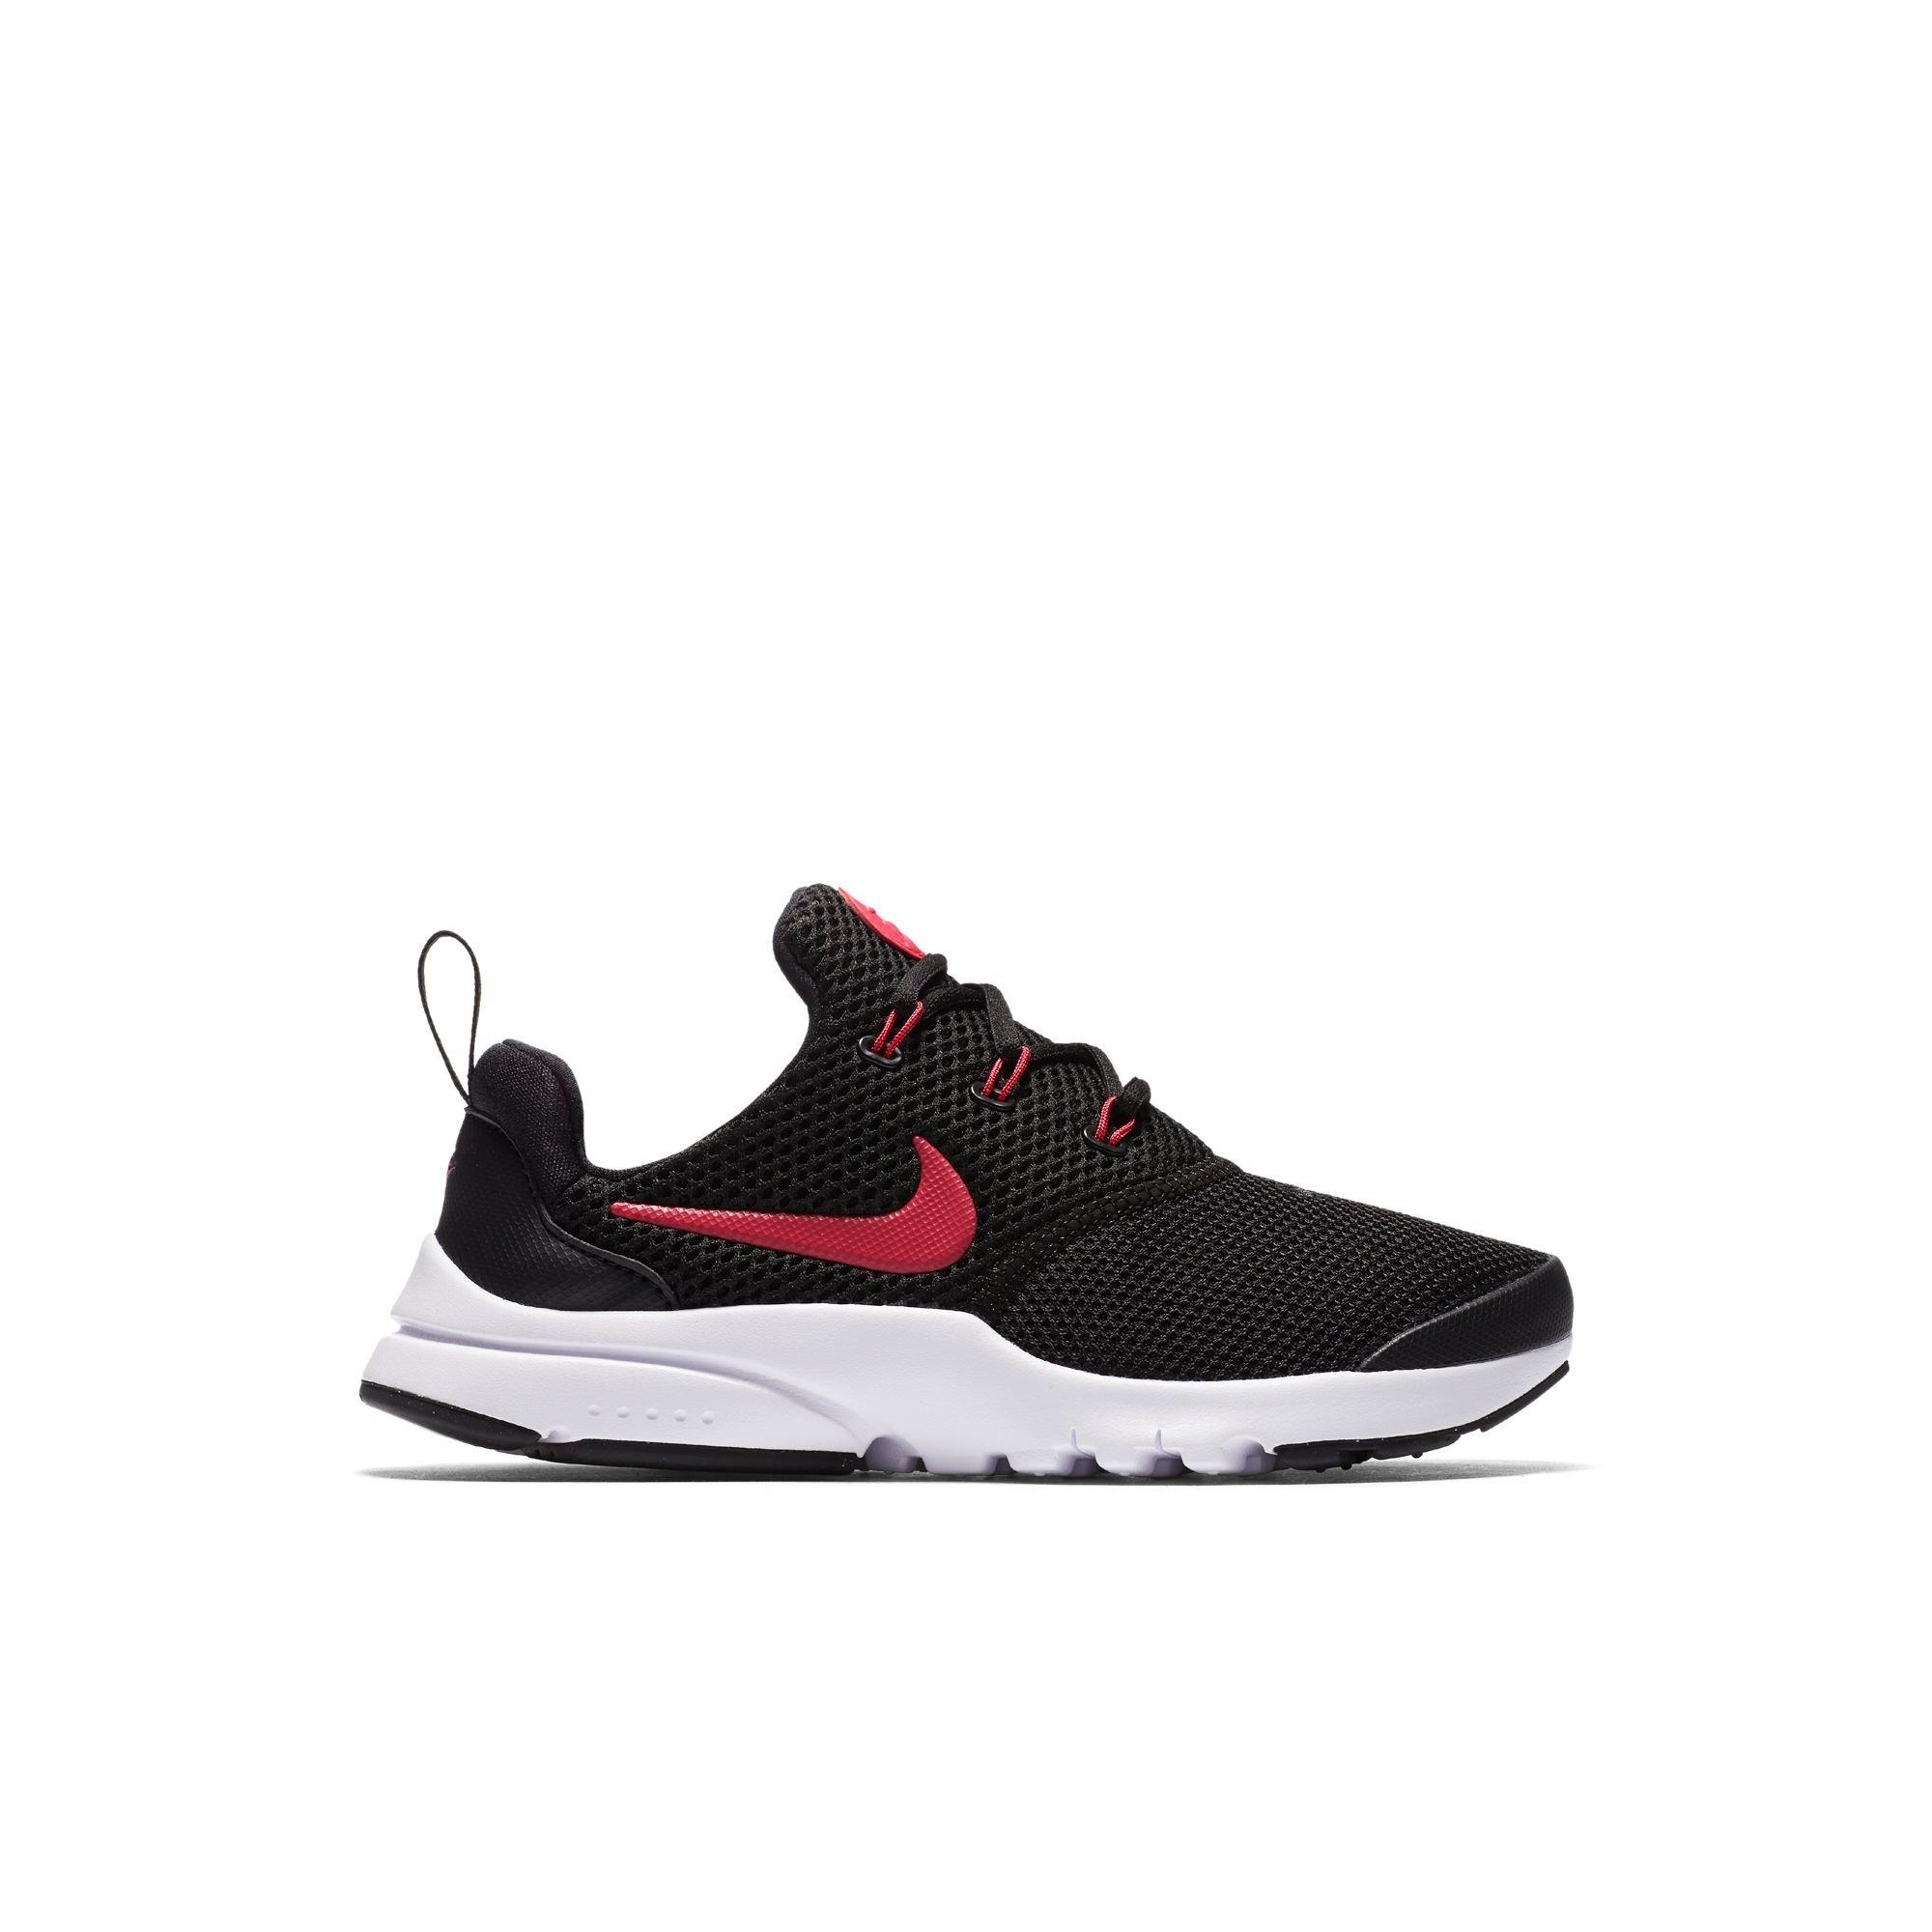 online store 43a8f 06536 Free Run 2 Junior Nike Free Rn Flyknit Kids' Running Shoe ...